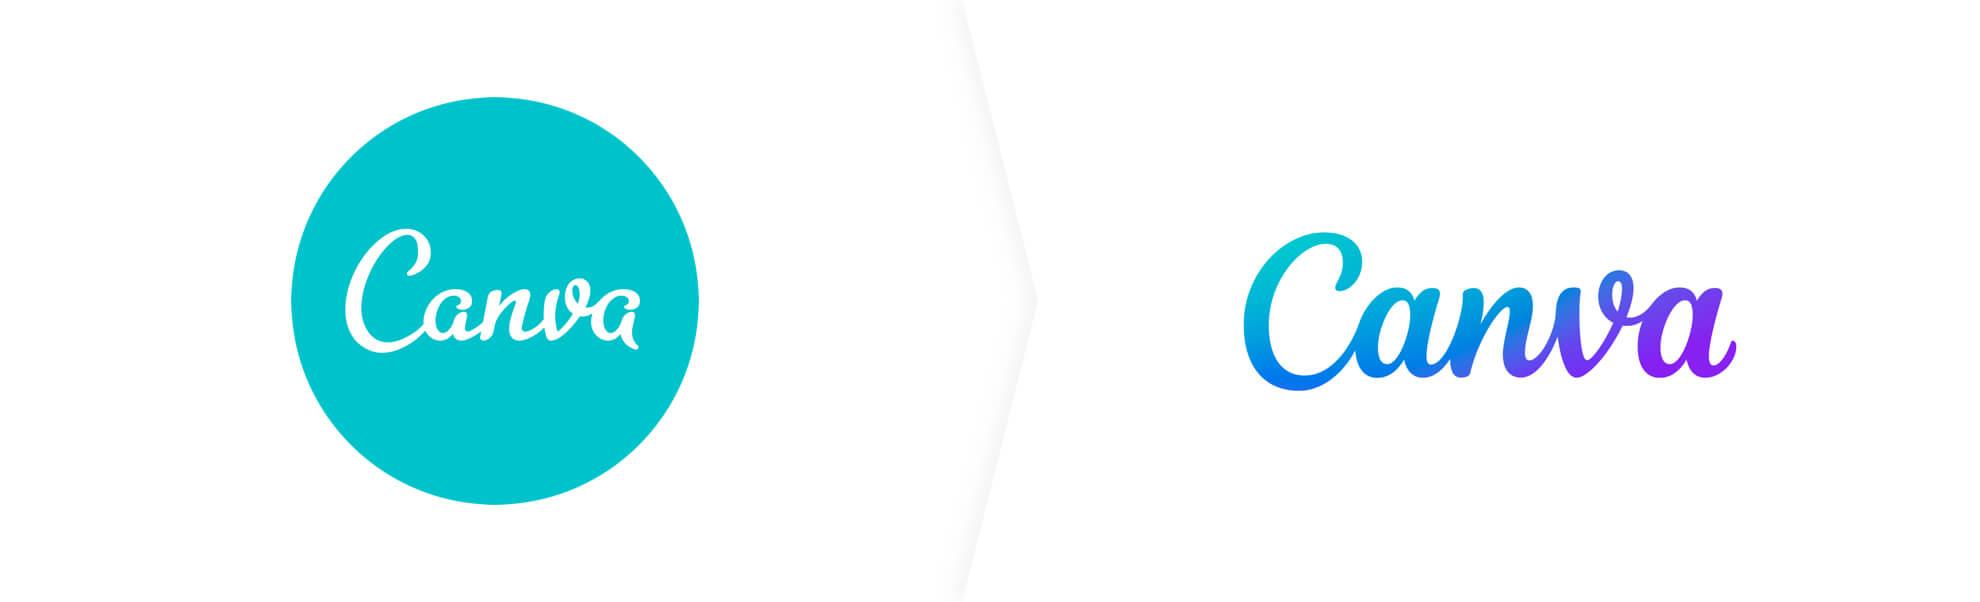 Stare i nowe logo Canva